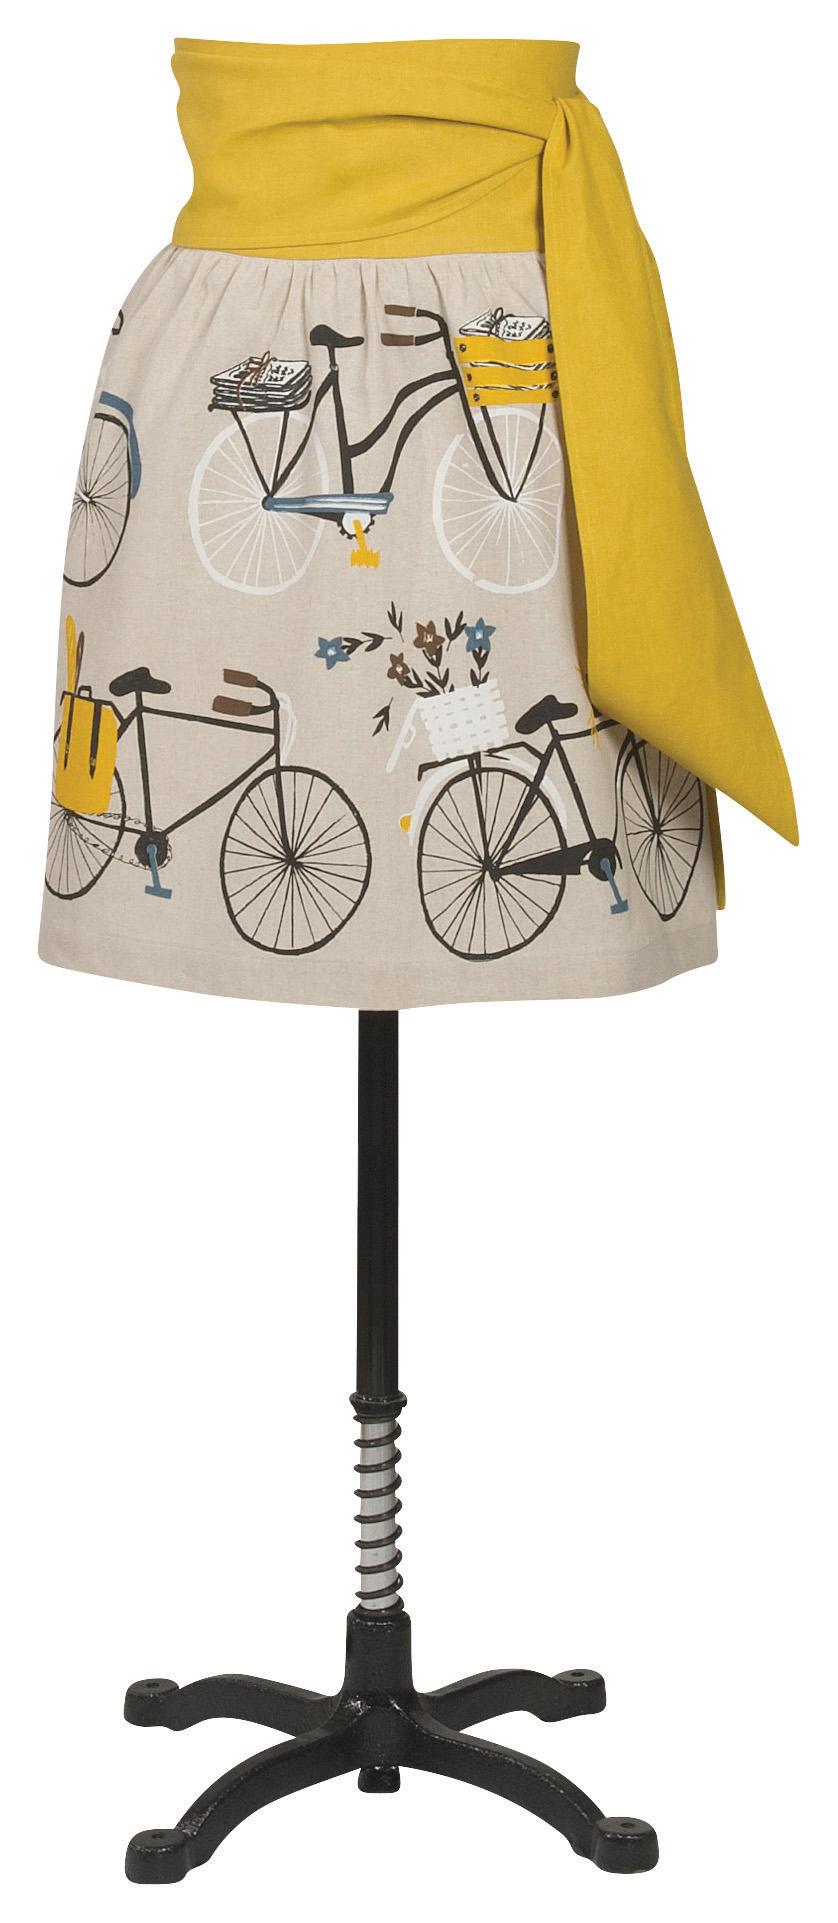 Apr Chloe Bicicletta